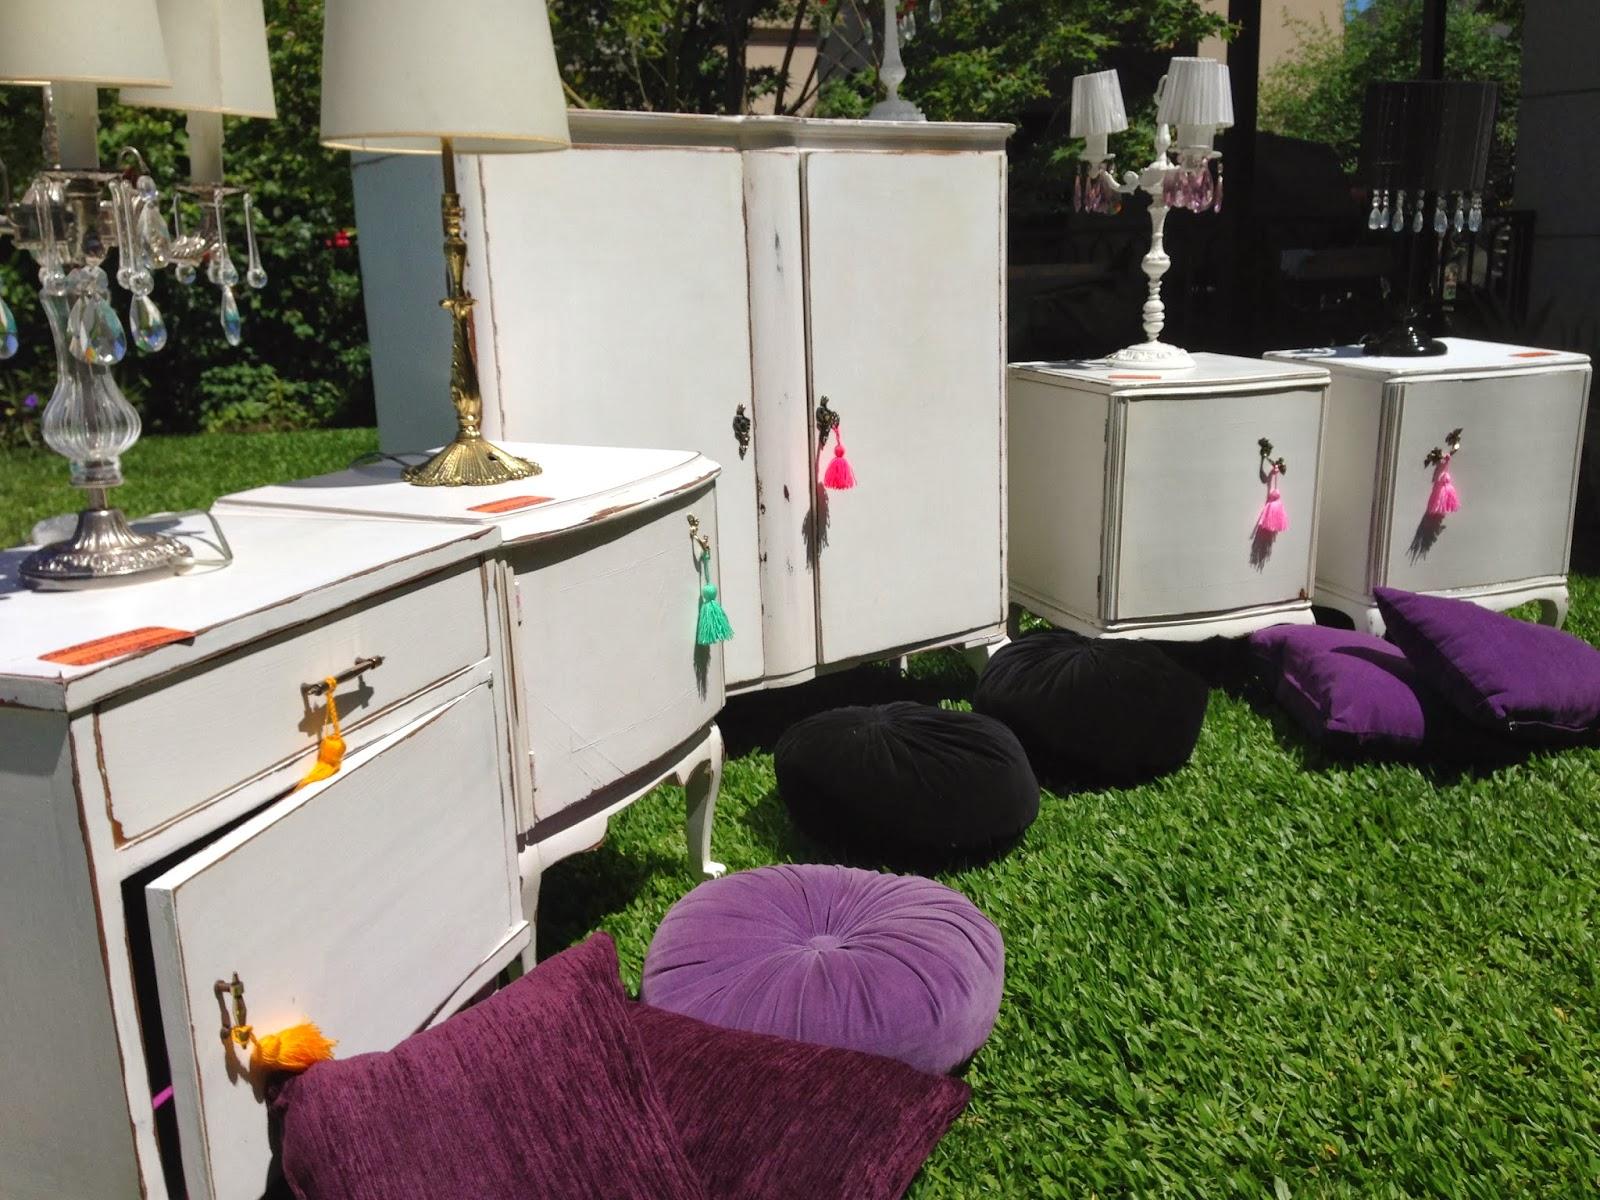 Vintouch muebles reciclados pintados a mano muebles for Muebles franceses